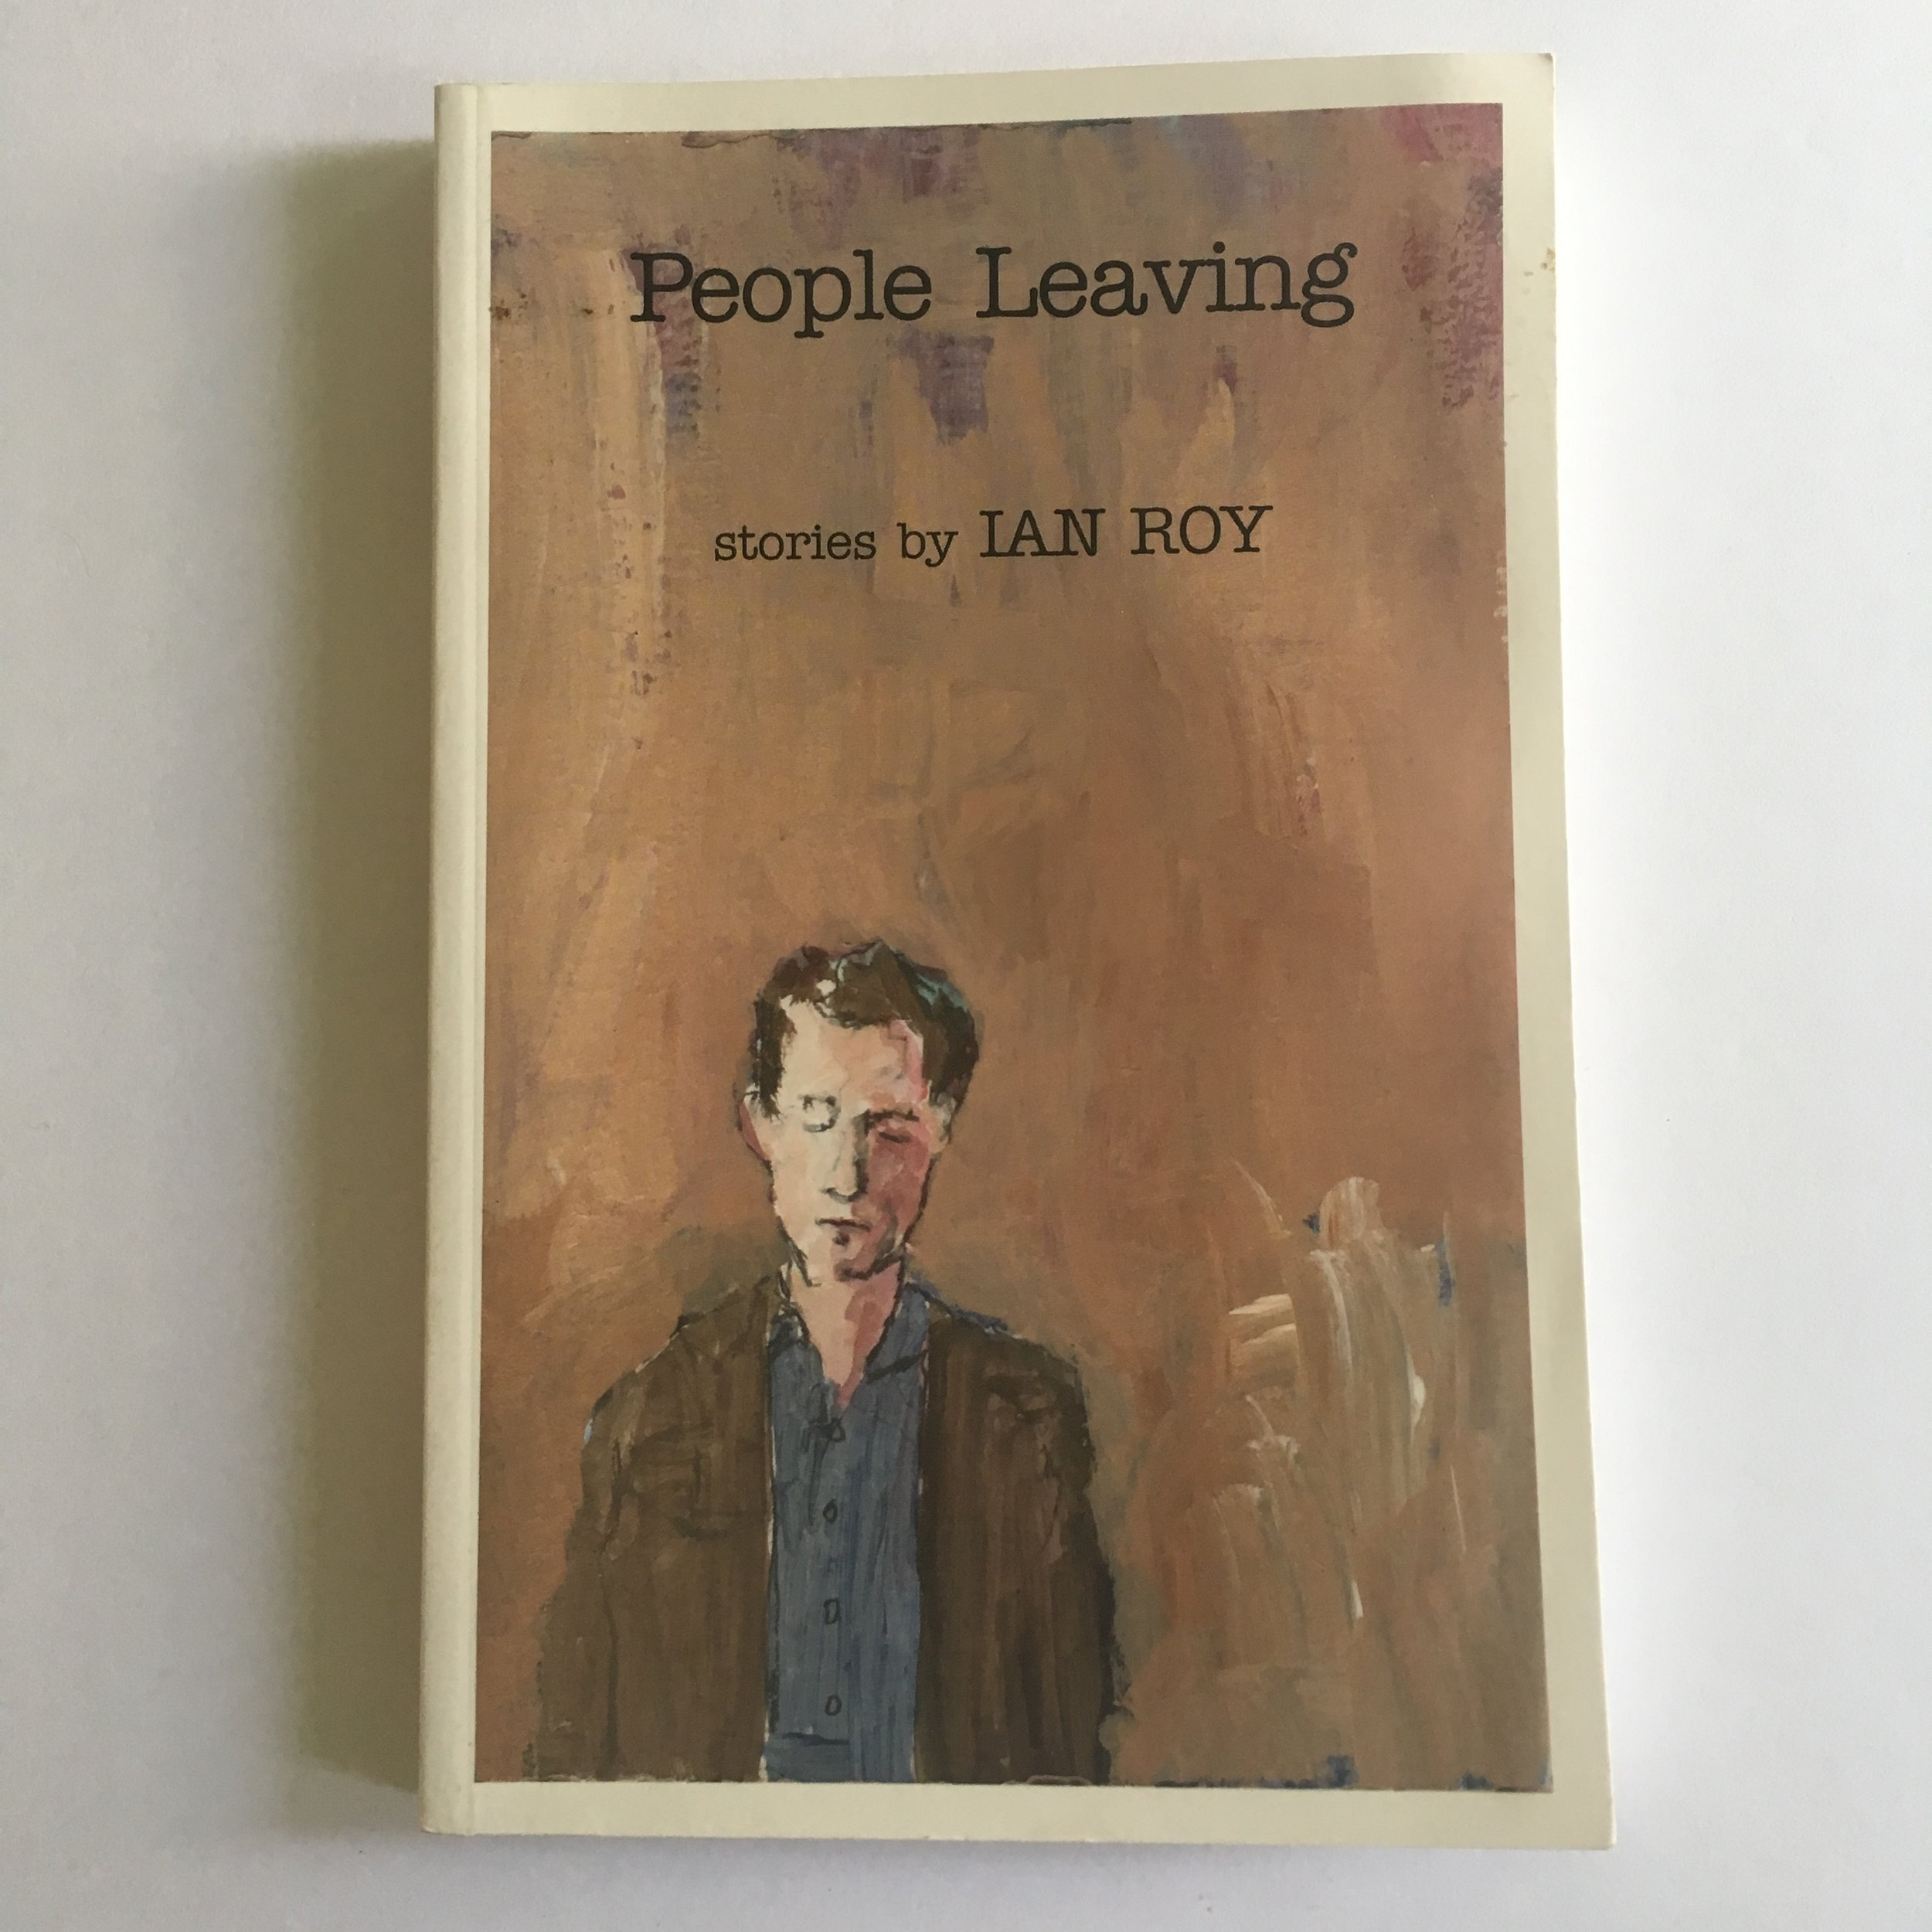 People Leaving - Ian Roy